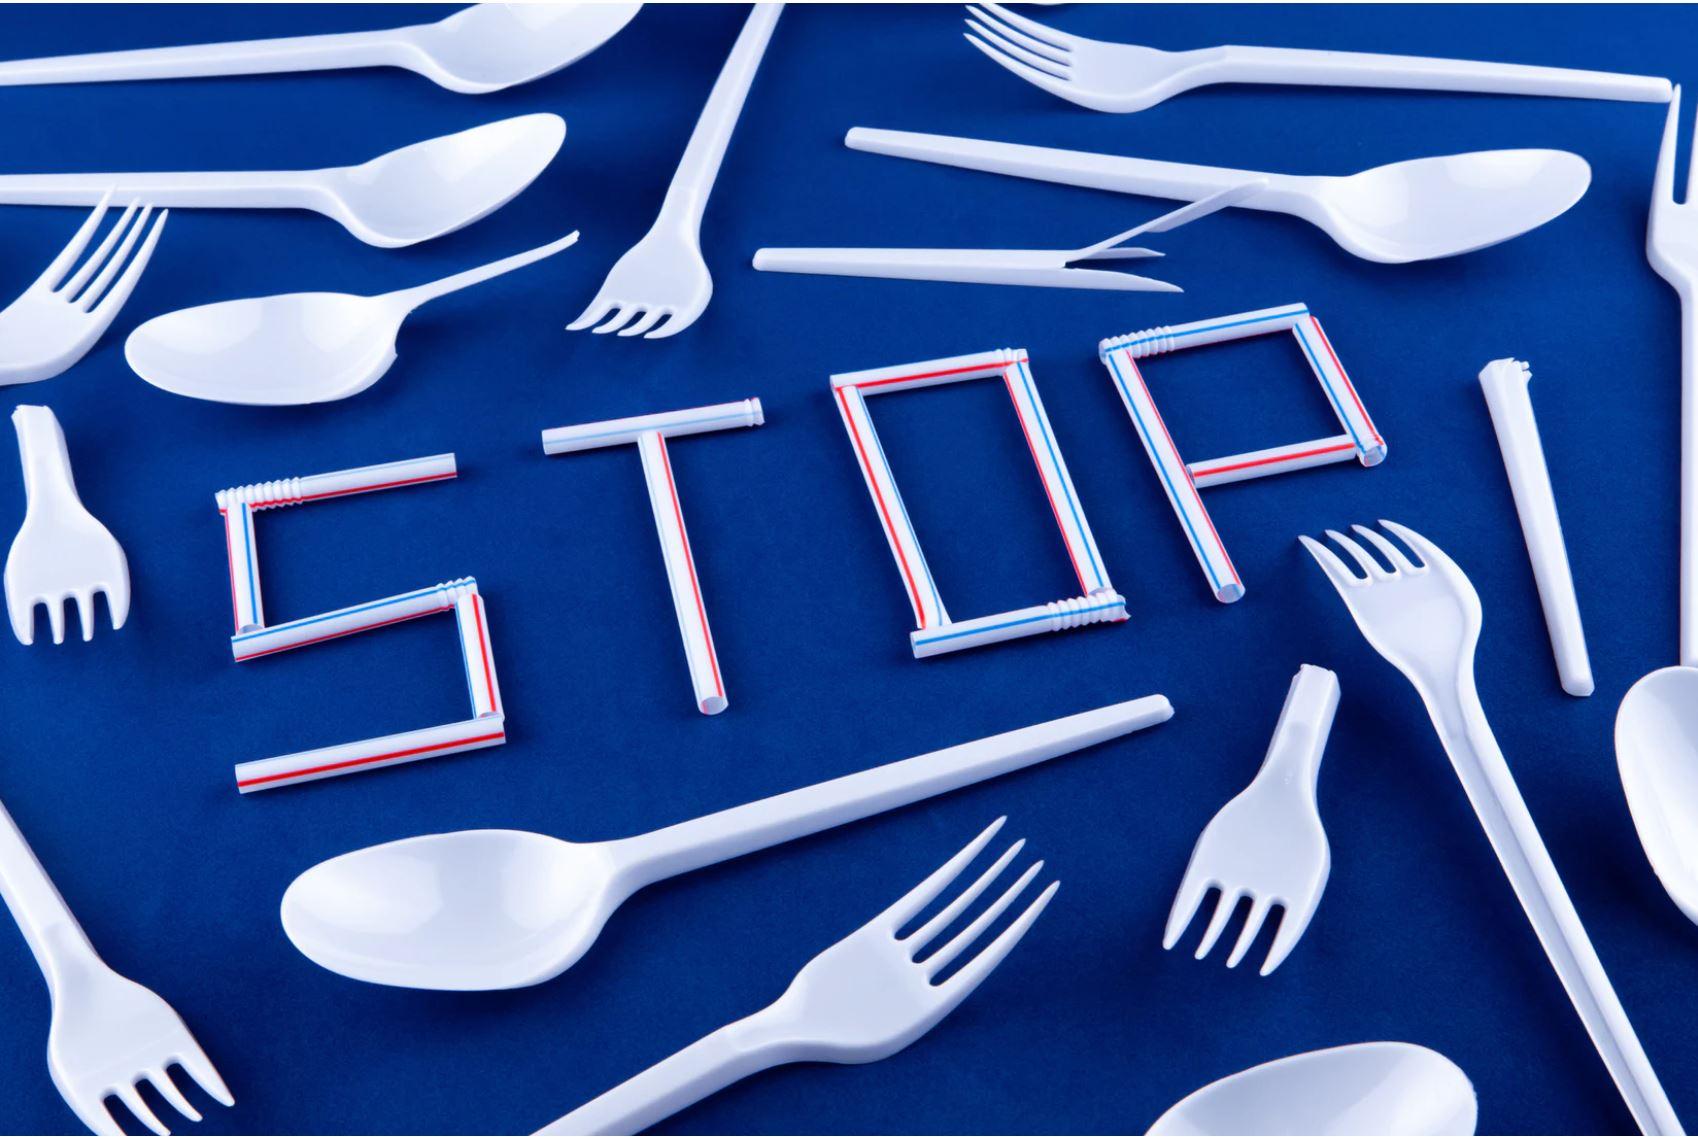 consumo sostenibile. posate plastica